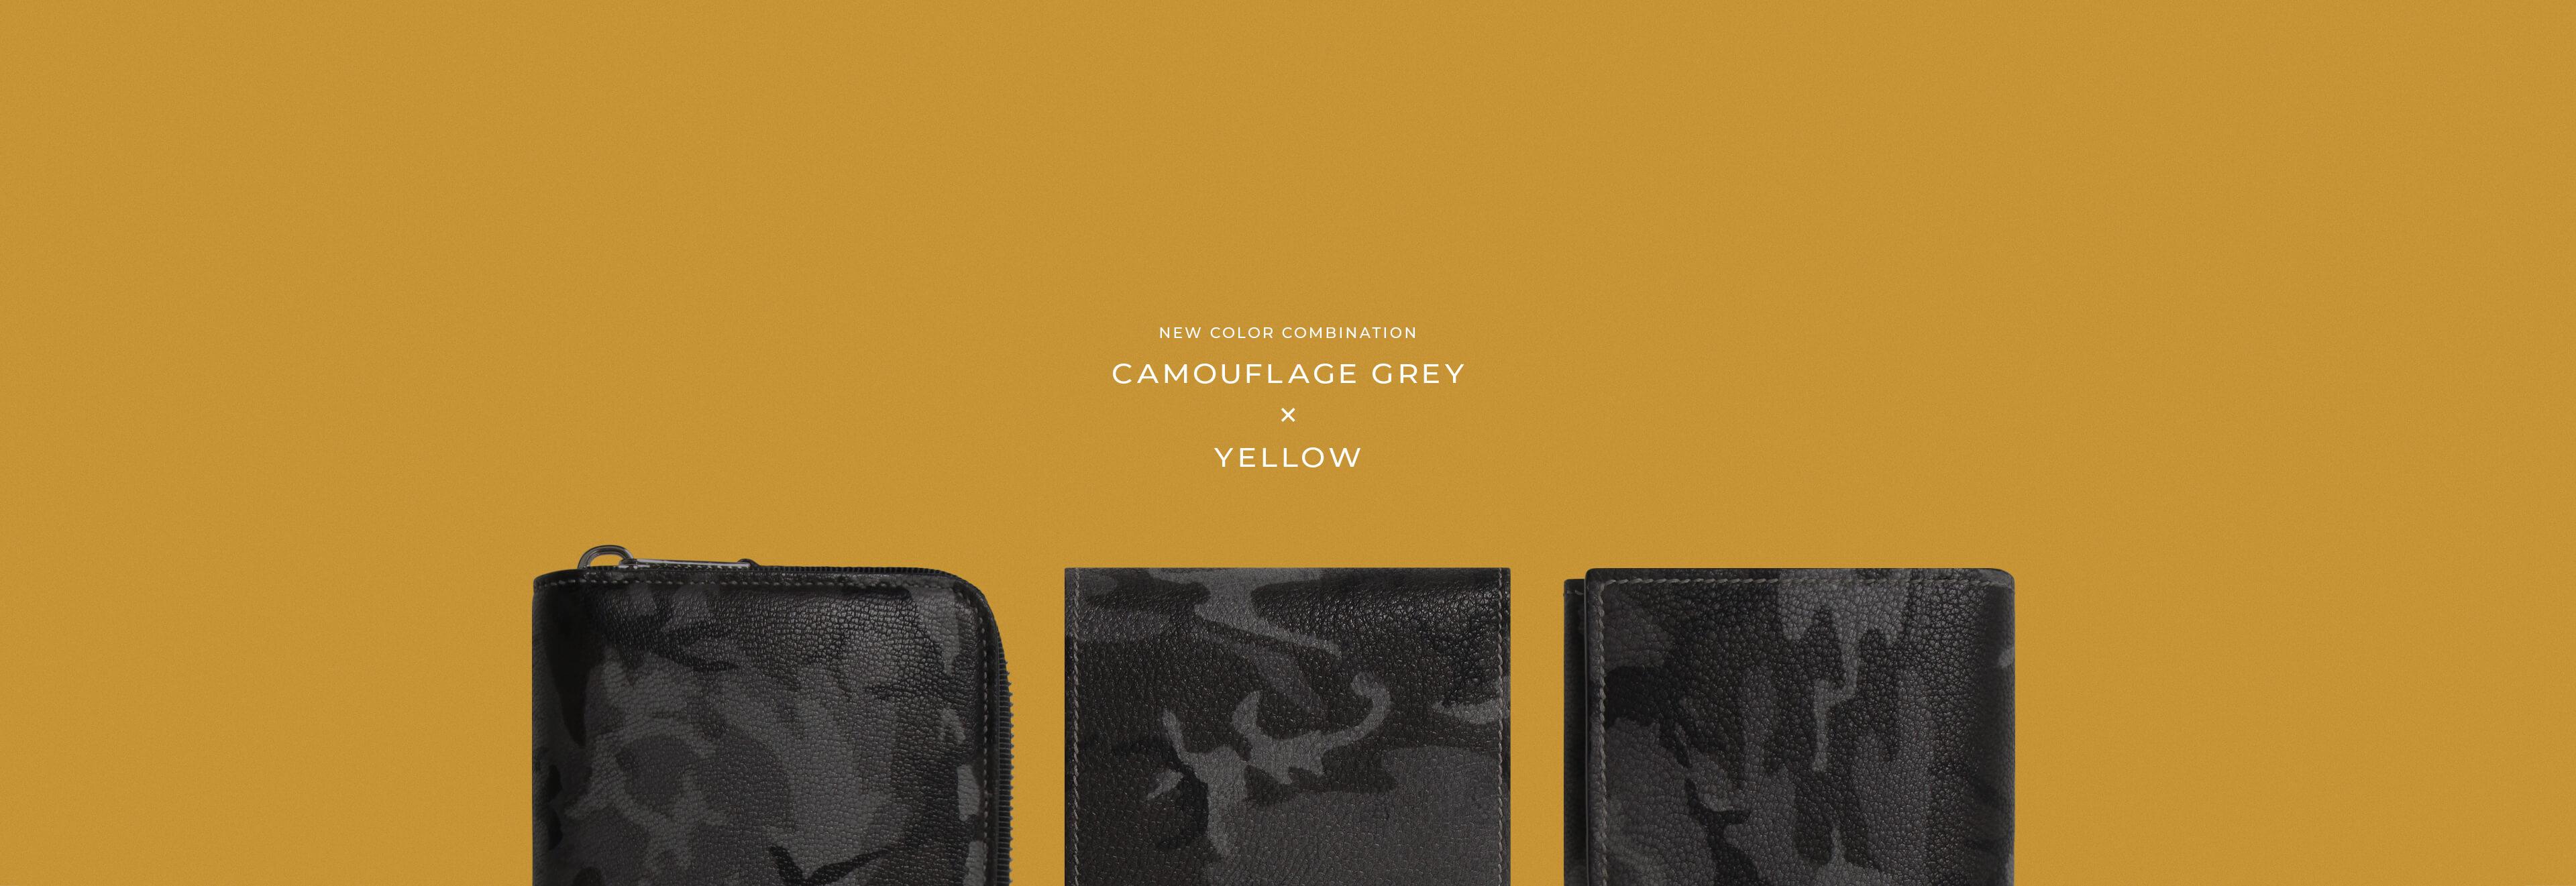 CAMOUFLAGE GREY x YELLOW